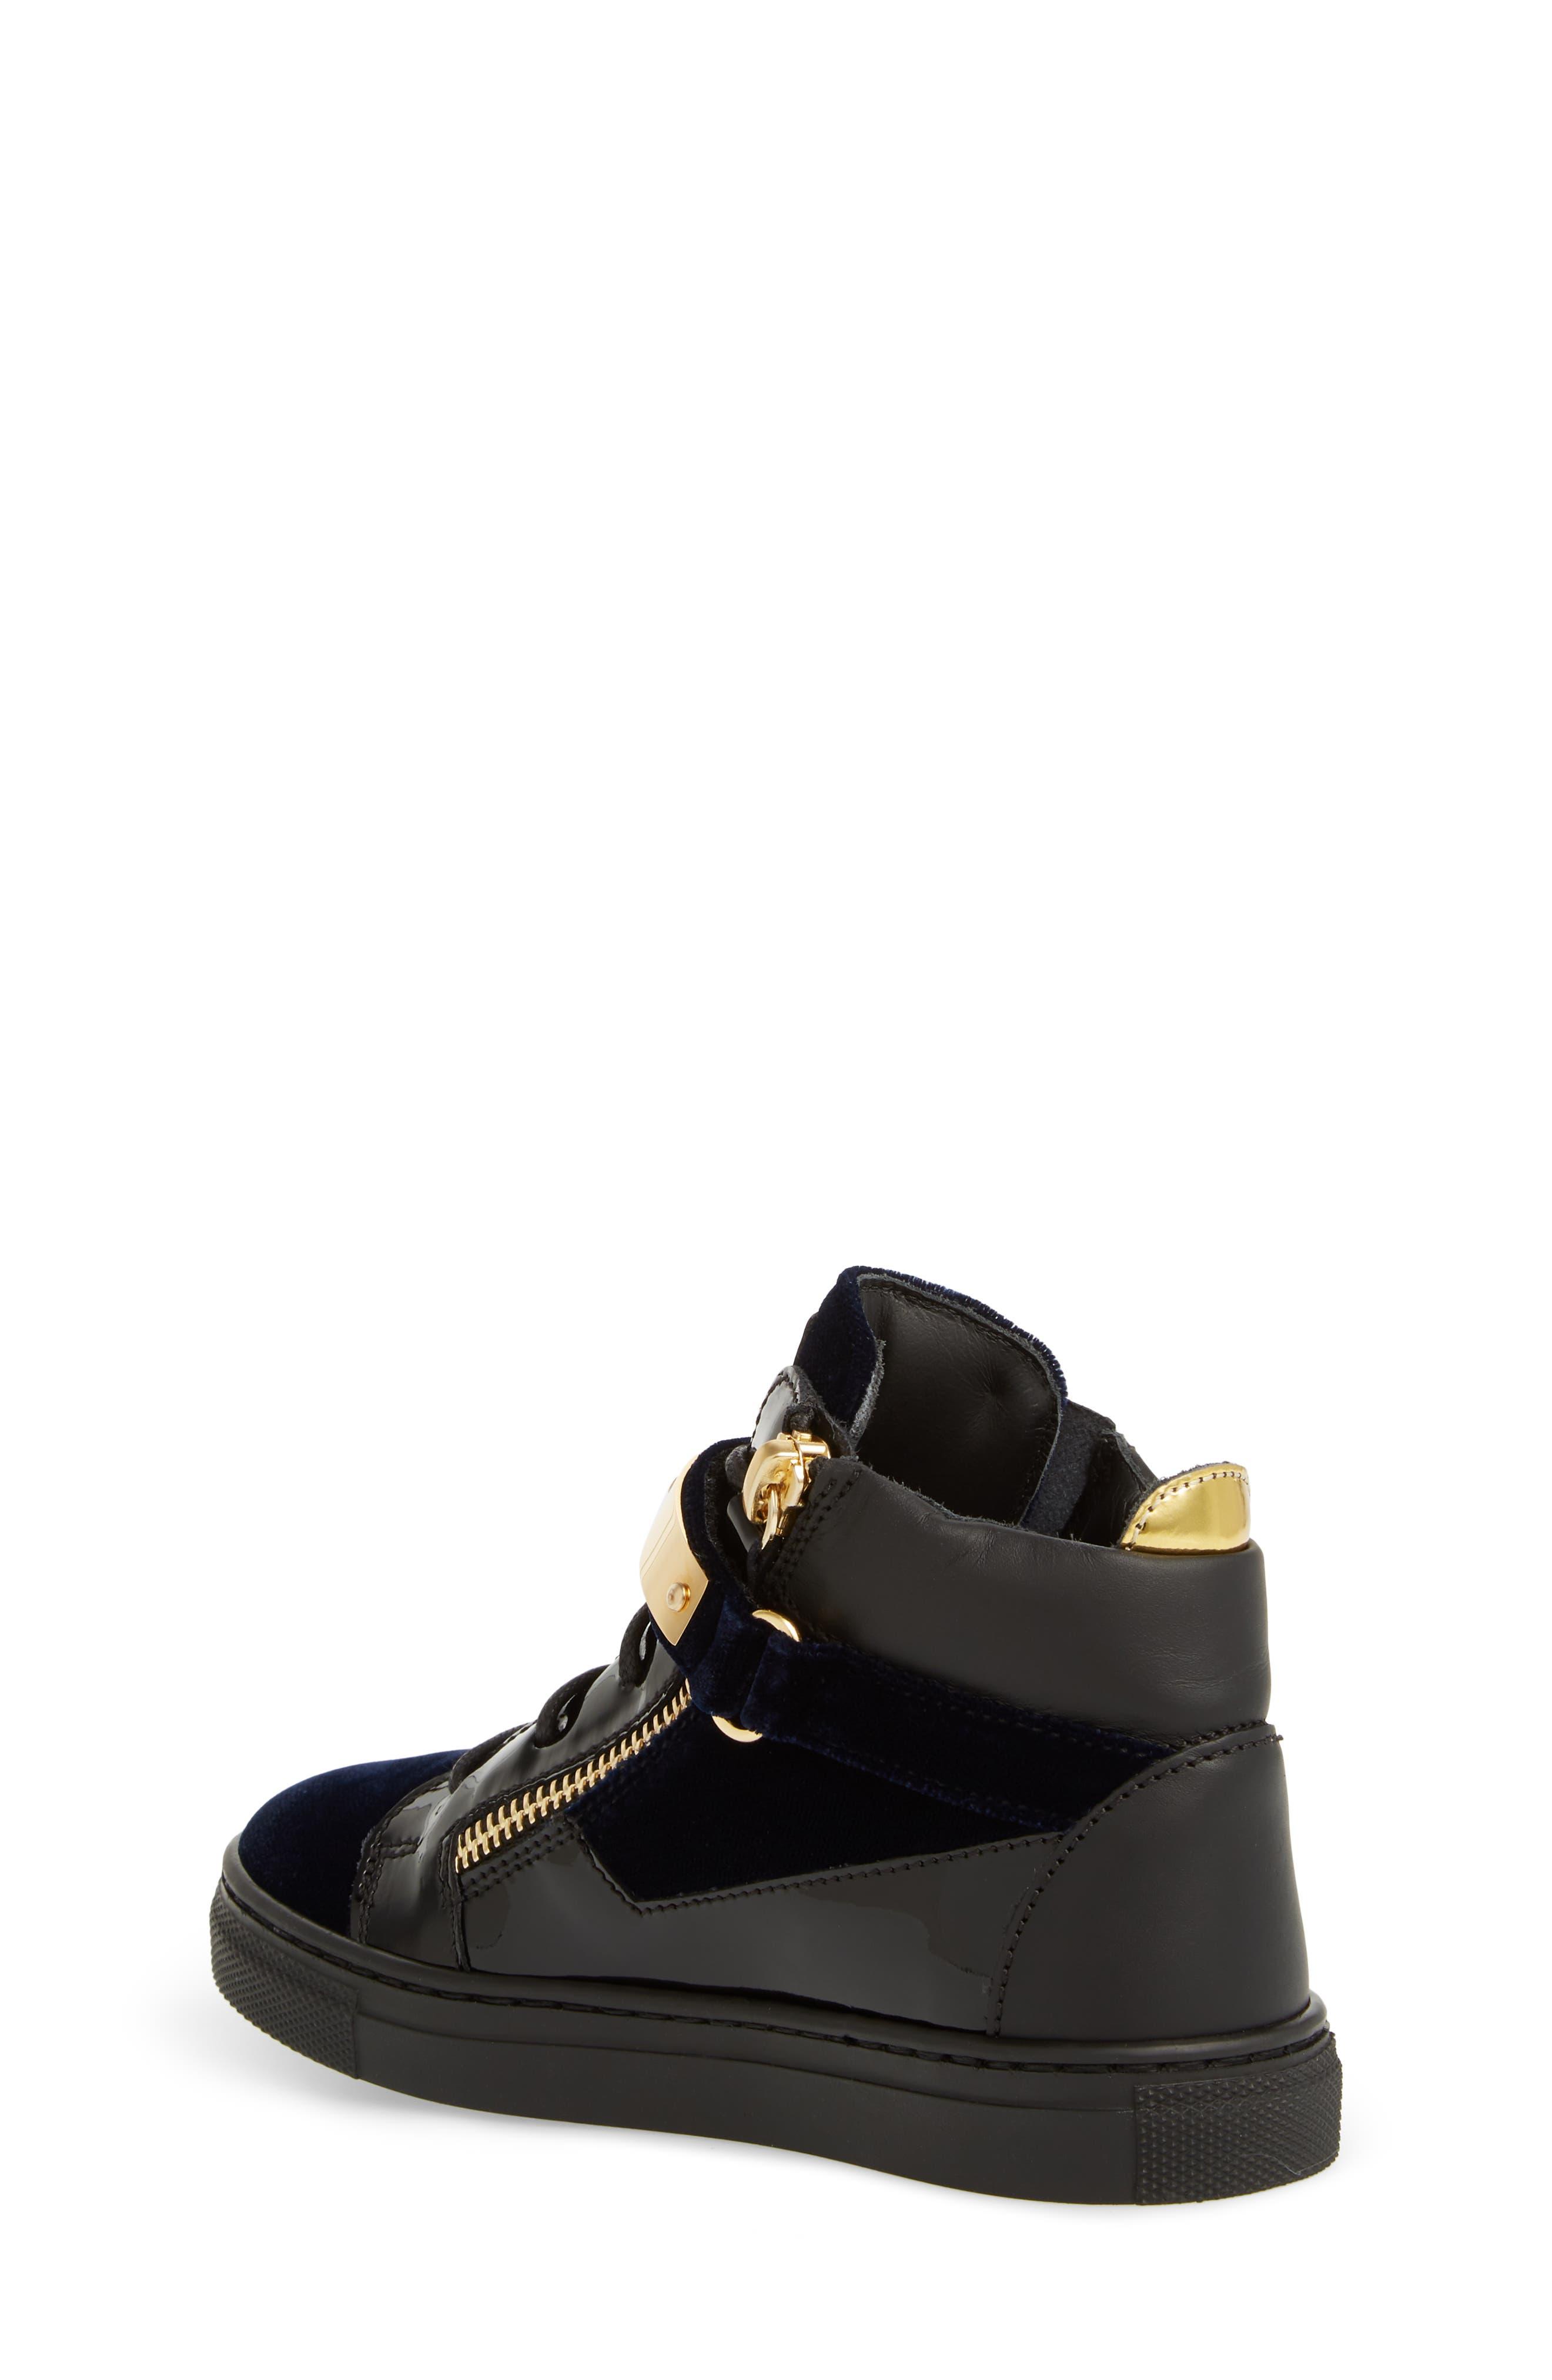 Gomma London Sneaker,                             Alternate thumbnail 2, color,